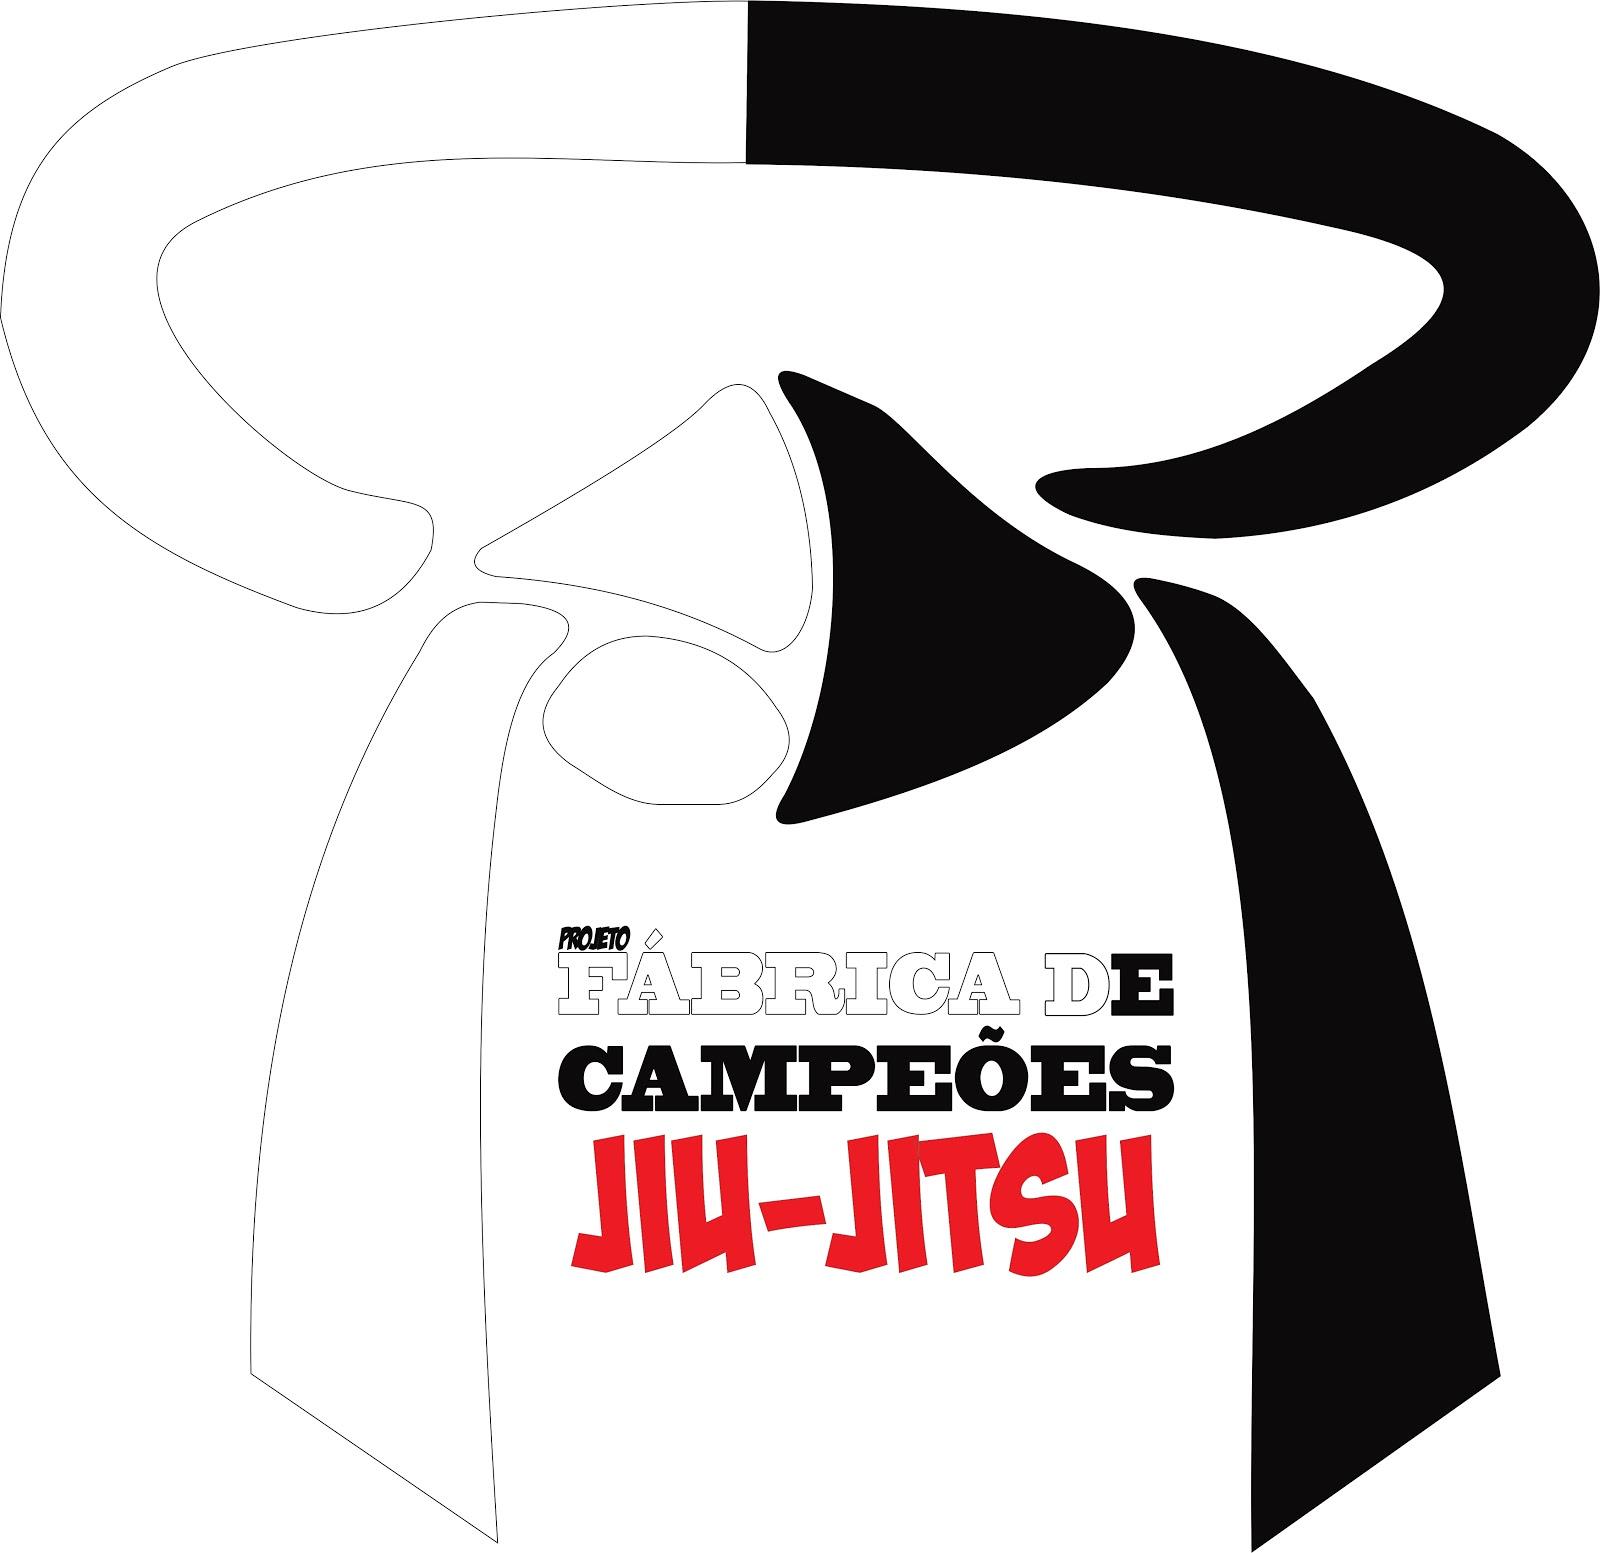 Advance Artesanato Osasco ~ Fábrica de Campeões Jiu Jitsu